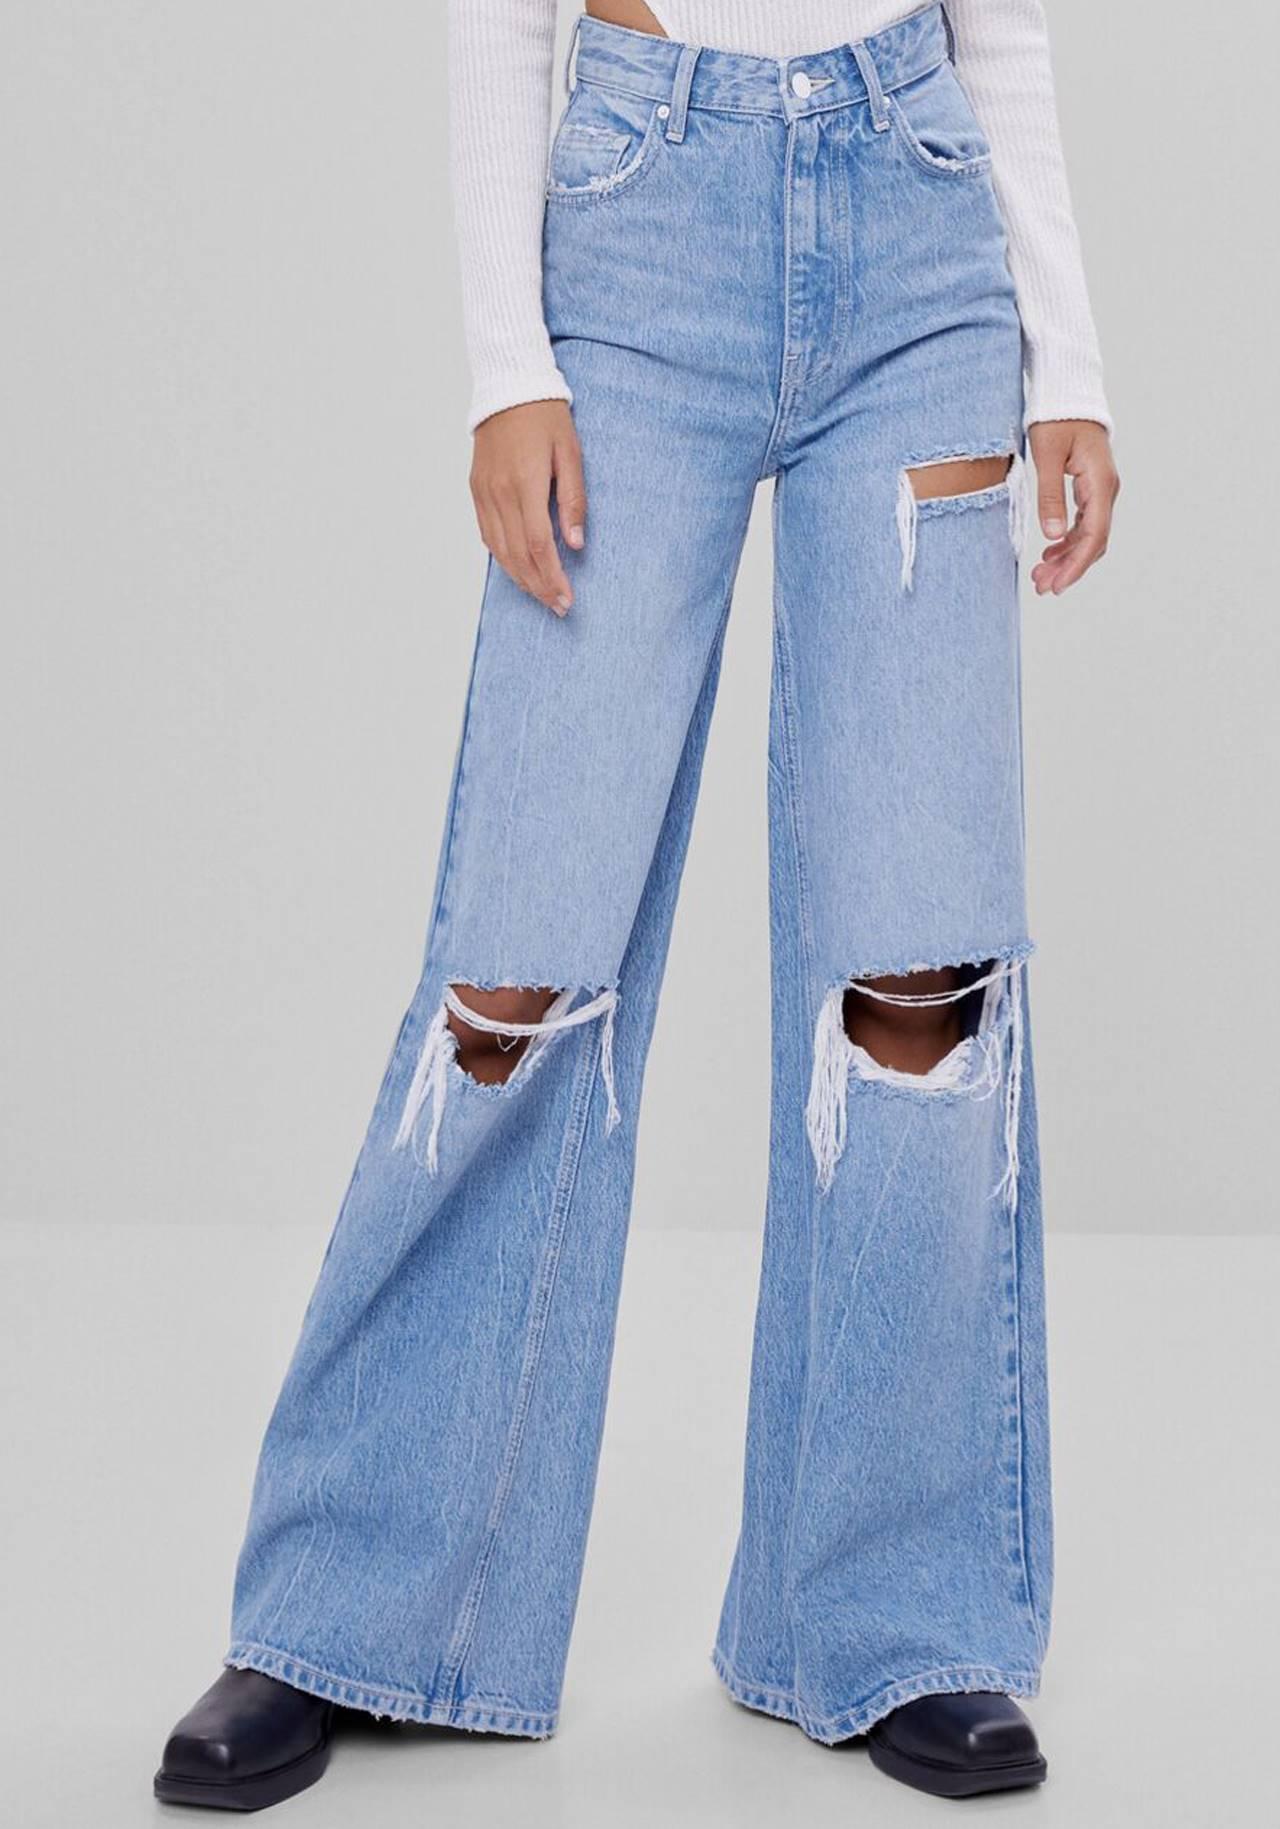 Abbraccio Alcune Idraulico Jeans A Campana Bershka Agingtheafricanlion Org